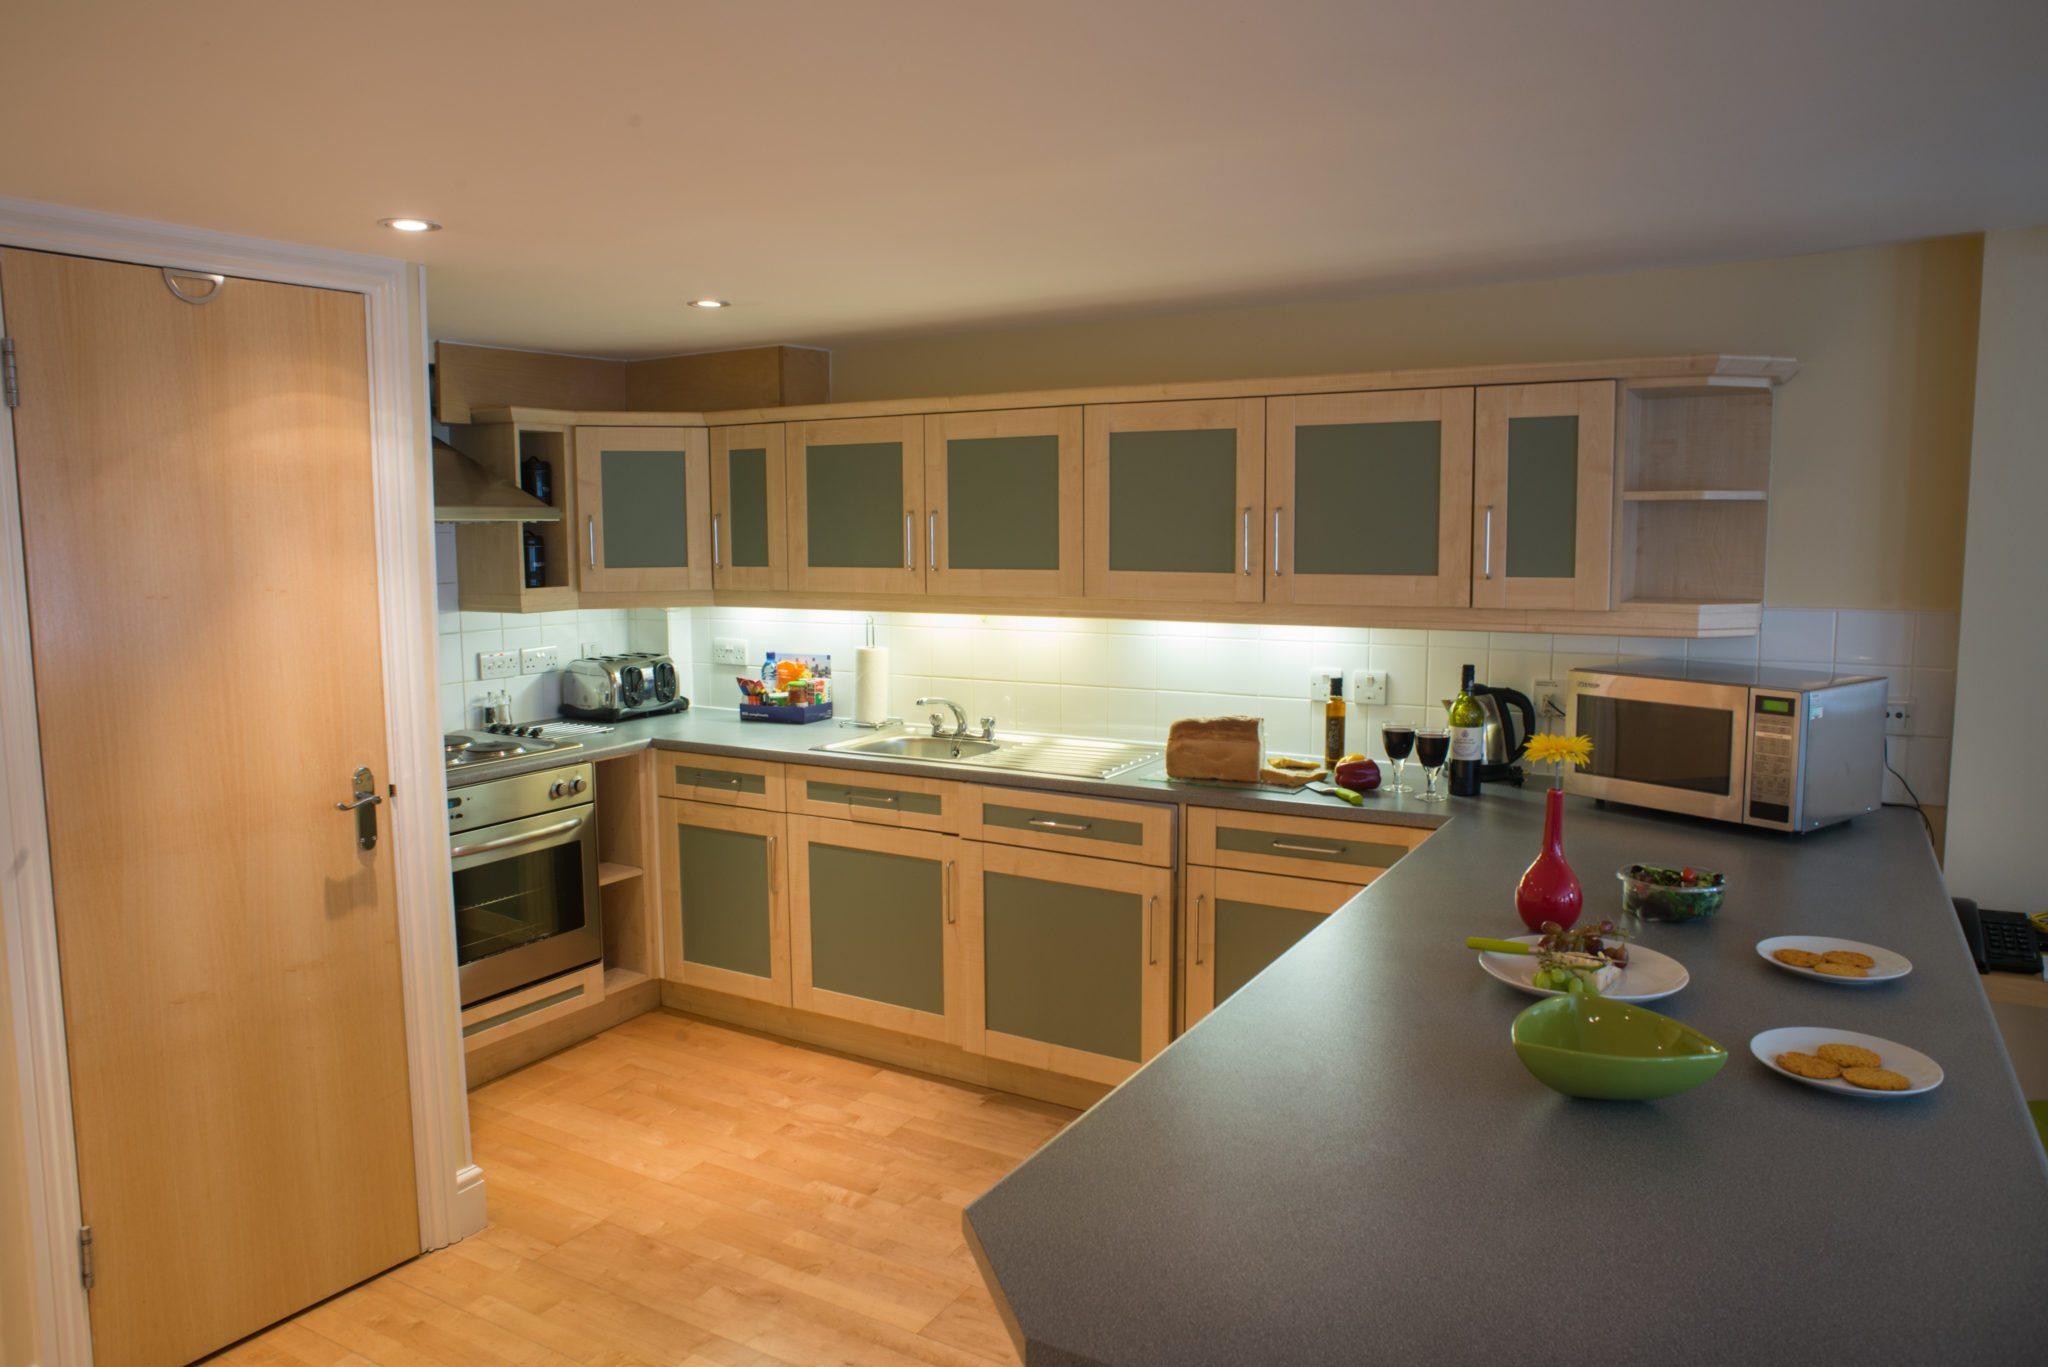 North-Mews-Serviced-Apartments---Holborn,-London